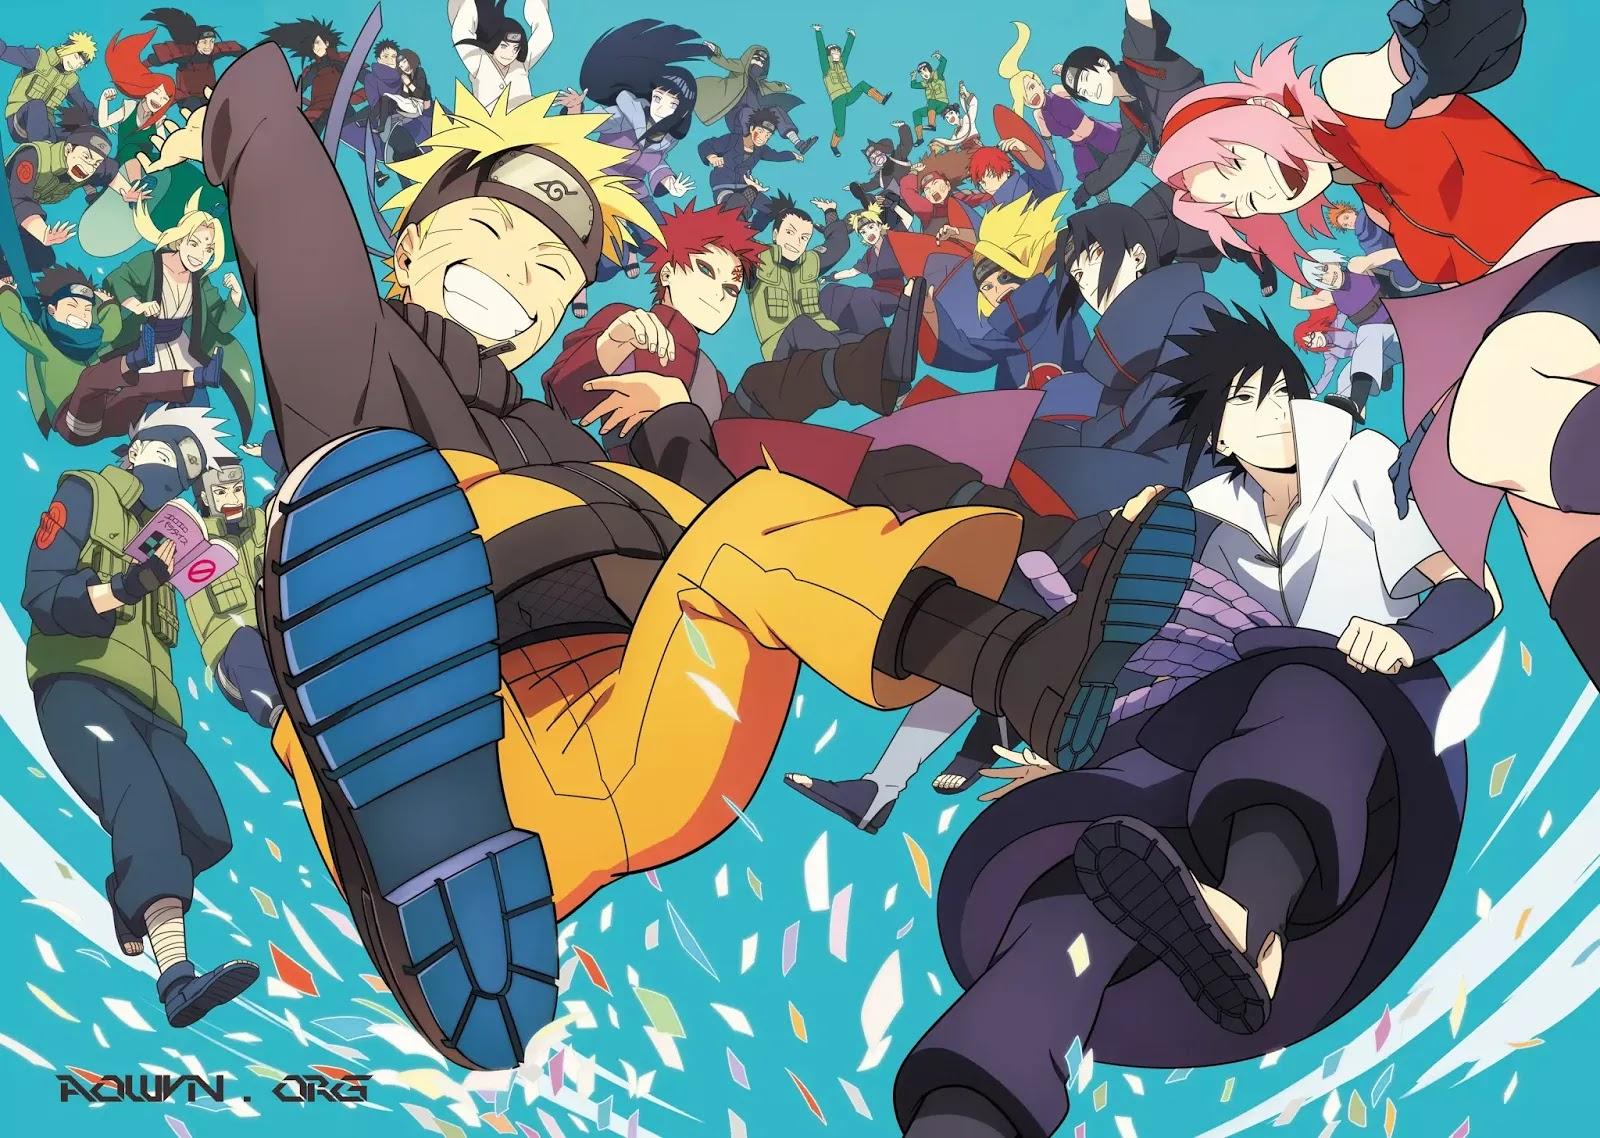 AowVN.org mizn%2B%25282%2529 - [ Anime 3gp Mp4 ] Naruto Shippuuden Season 2  | Vietsub - Huyền thoại